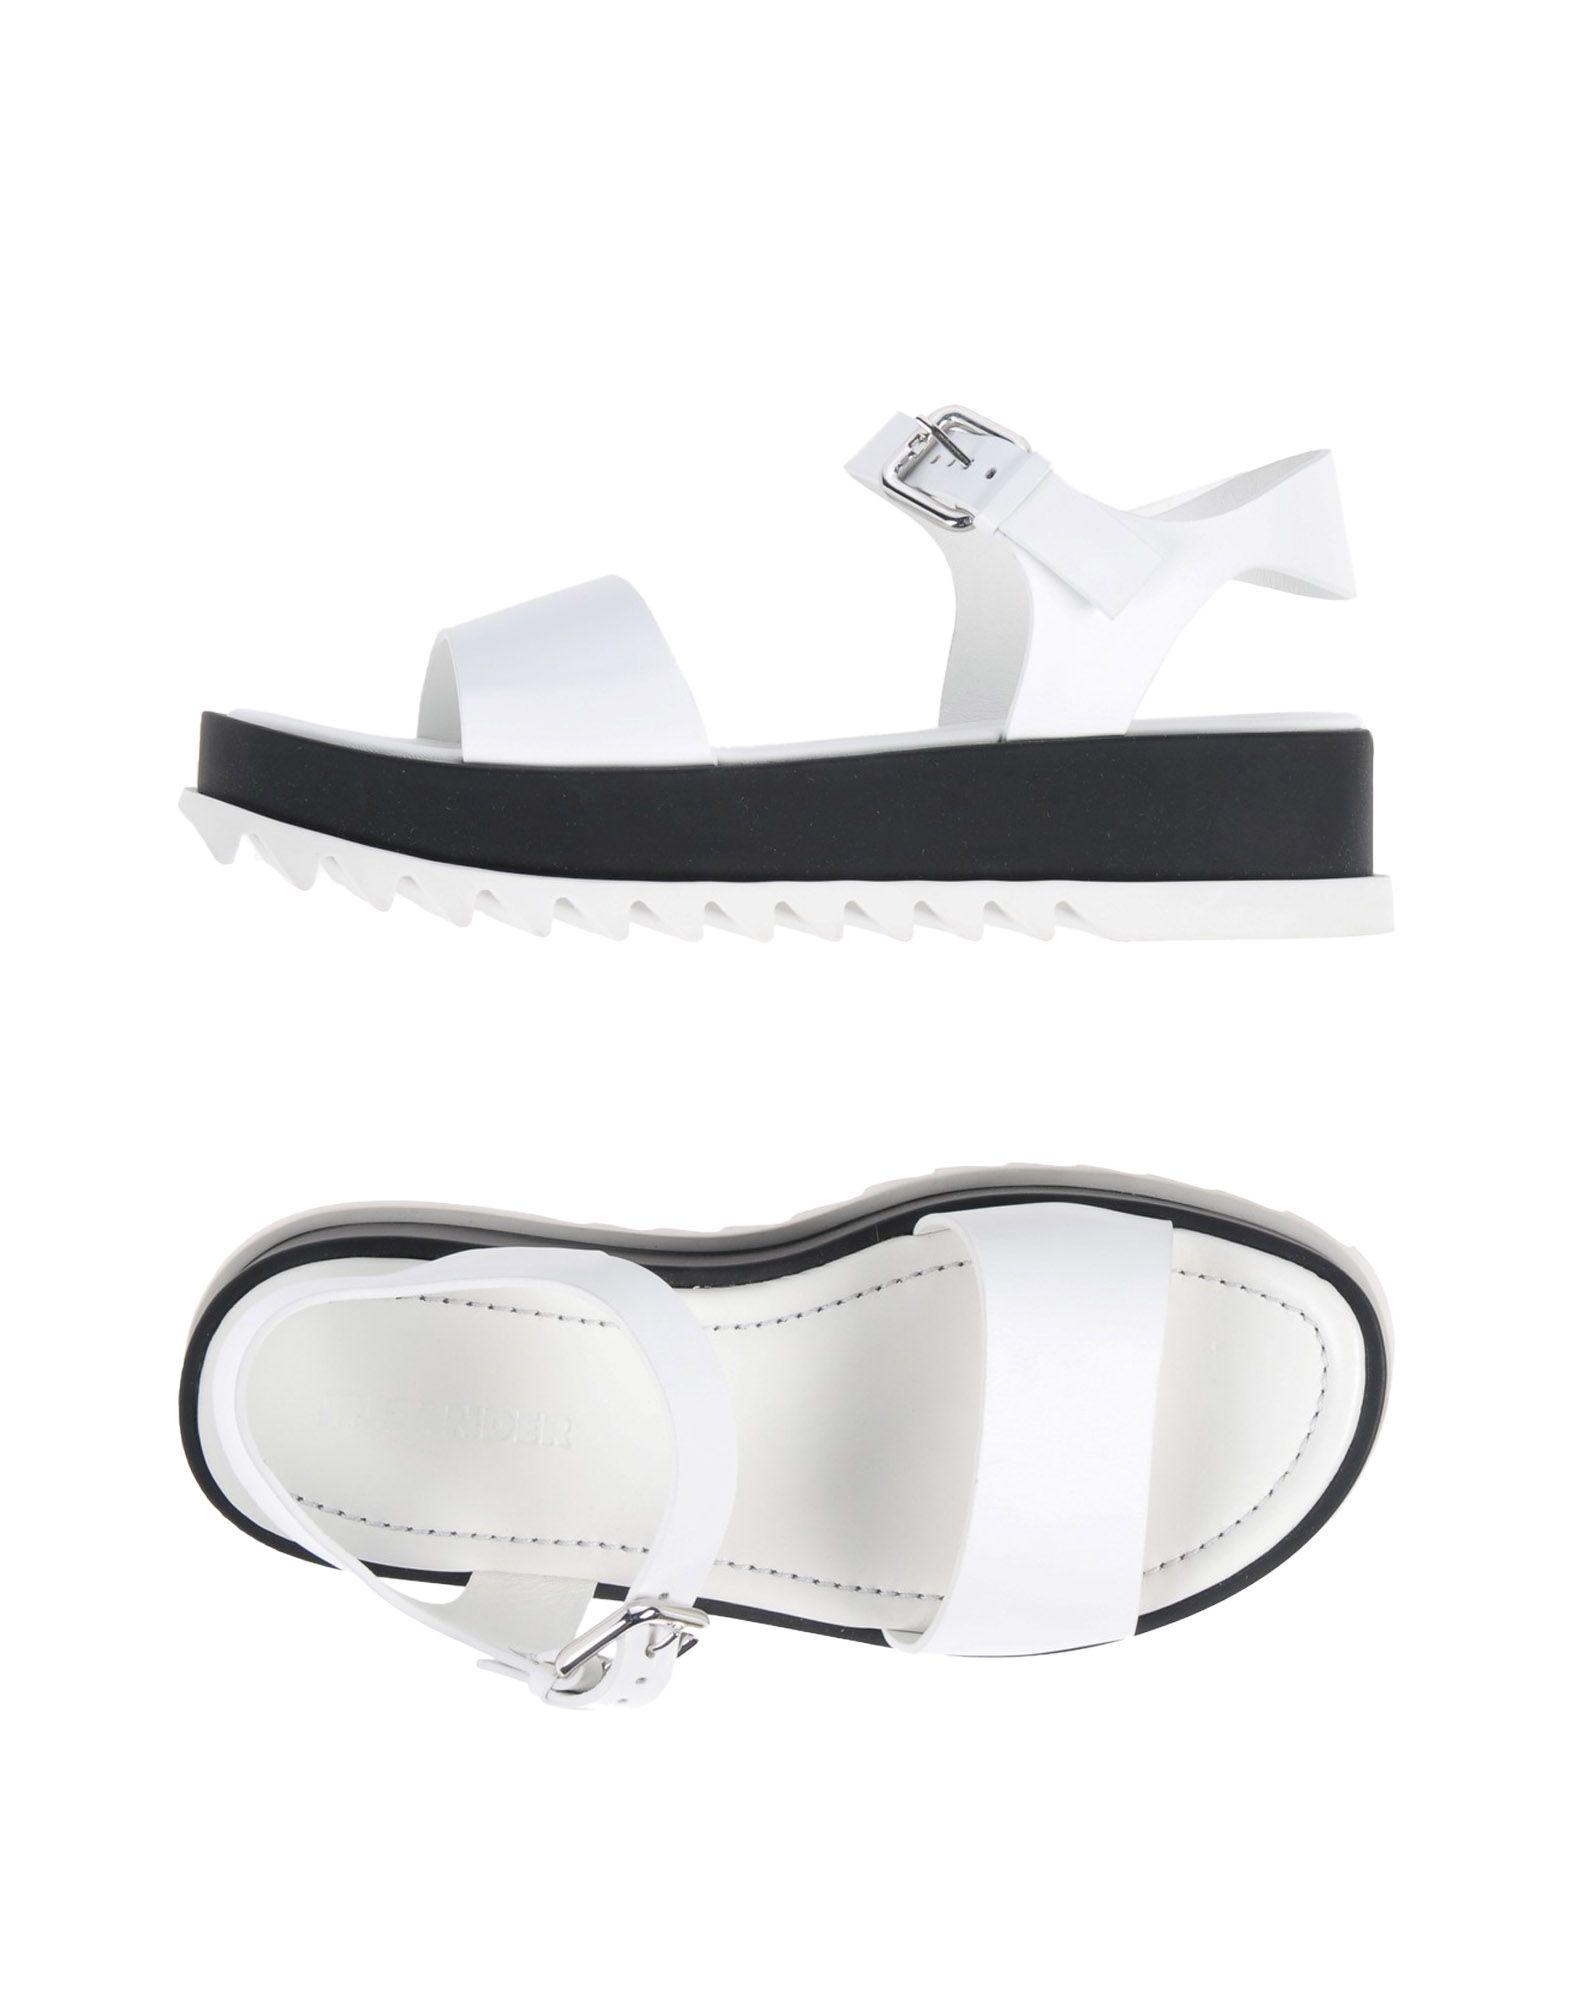 Stilvolle billige Schuhe Jil Sander Sandalen Damen  11244887IF